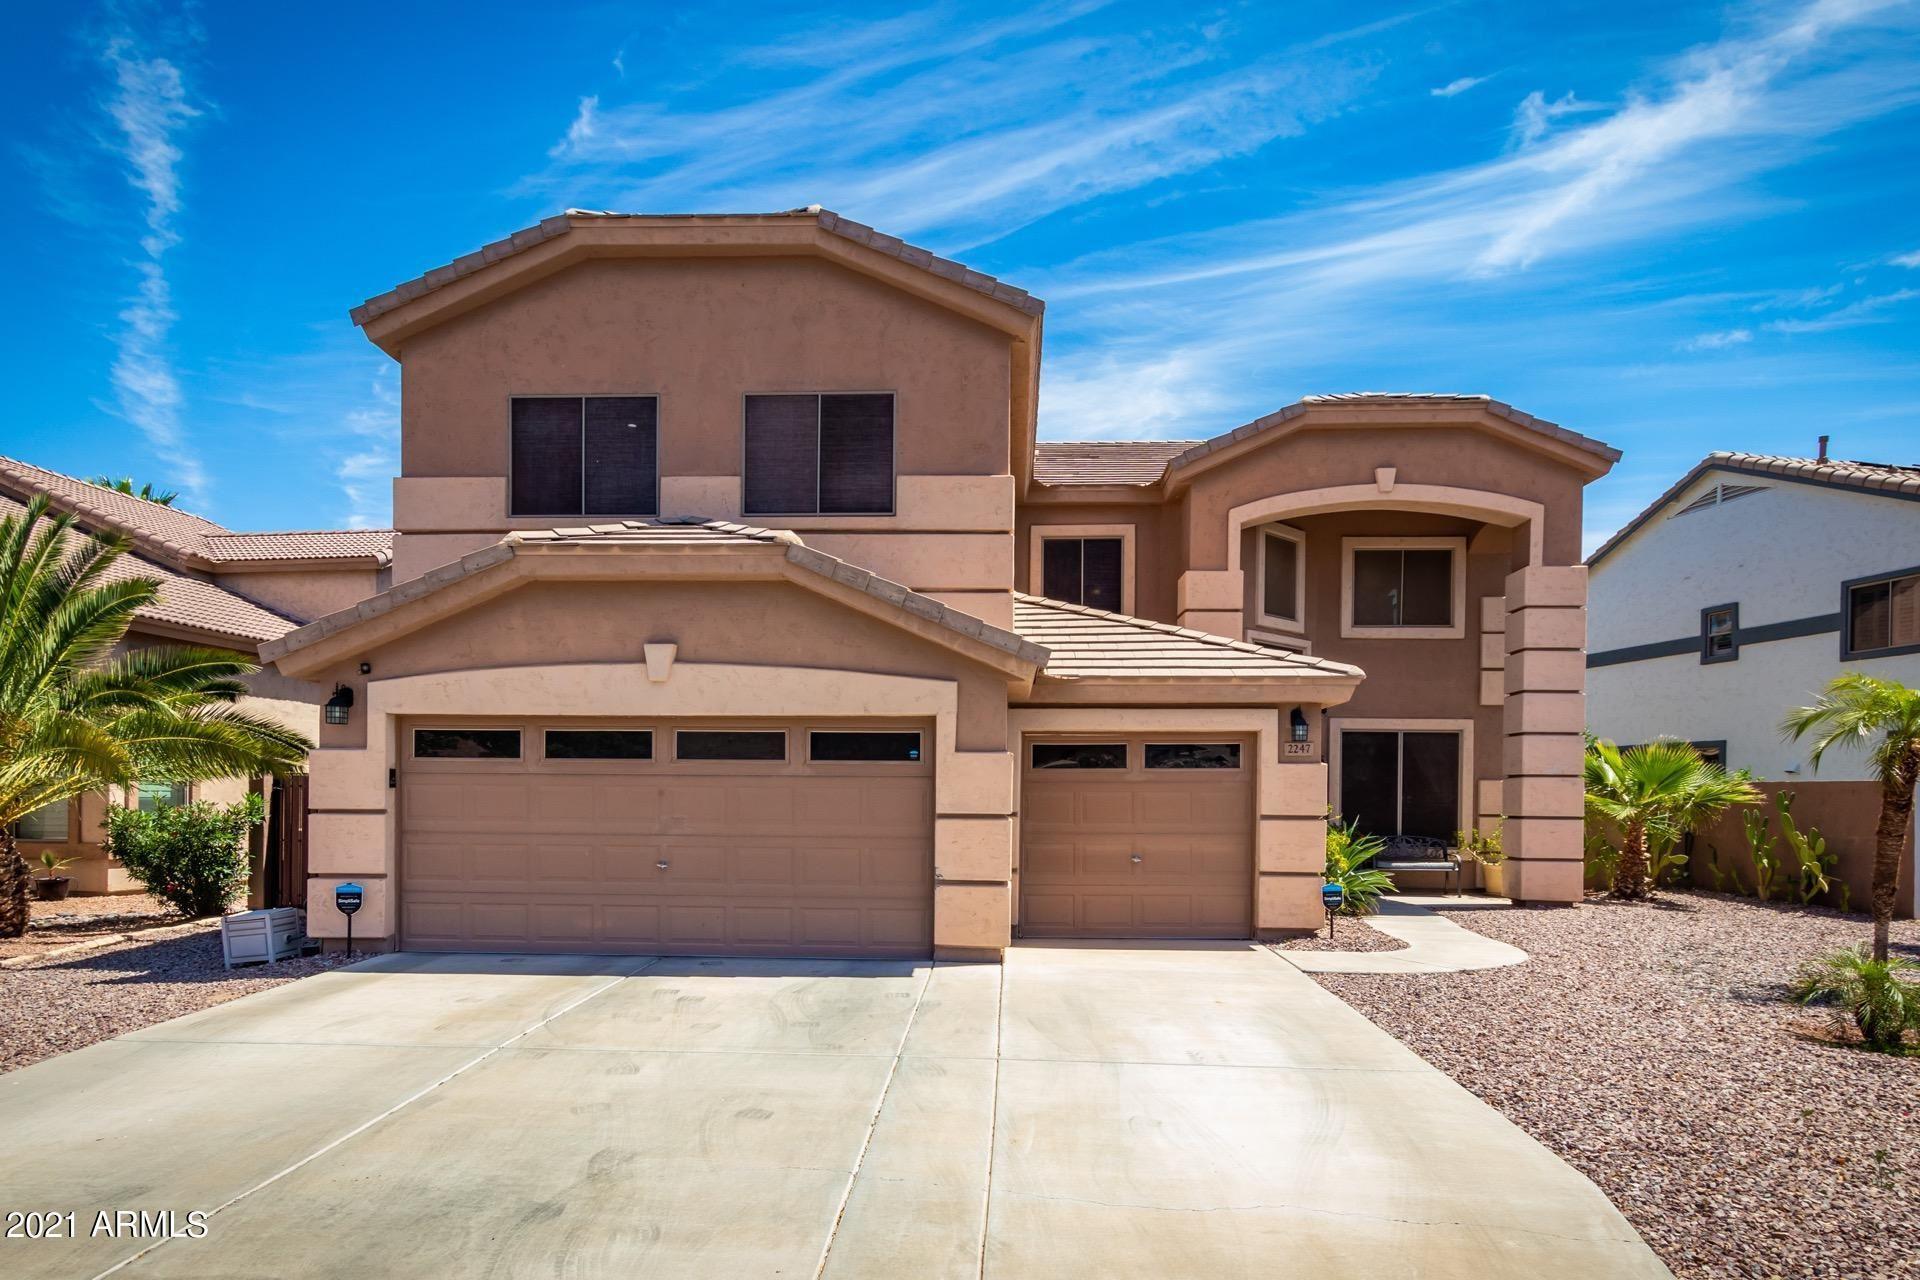 Photo of 2247 S LABELLE --, Mesa, AZ 85209 (MLS # 6232304)